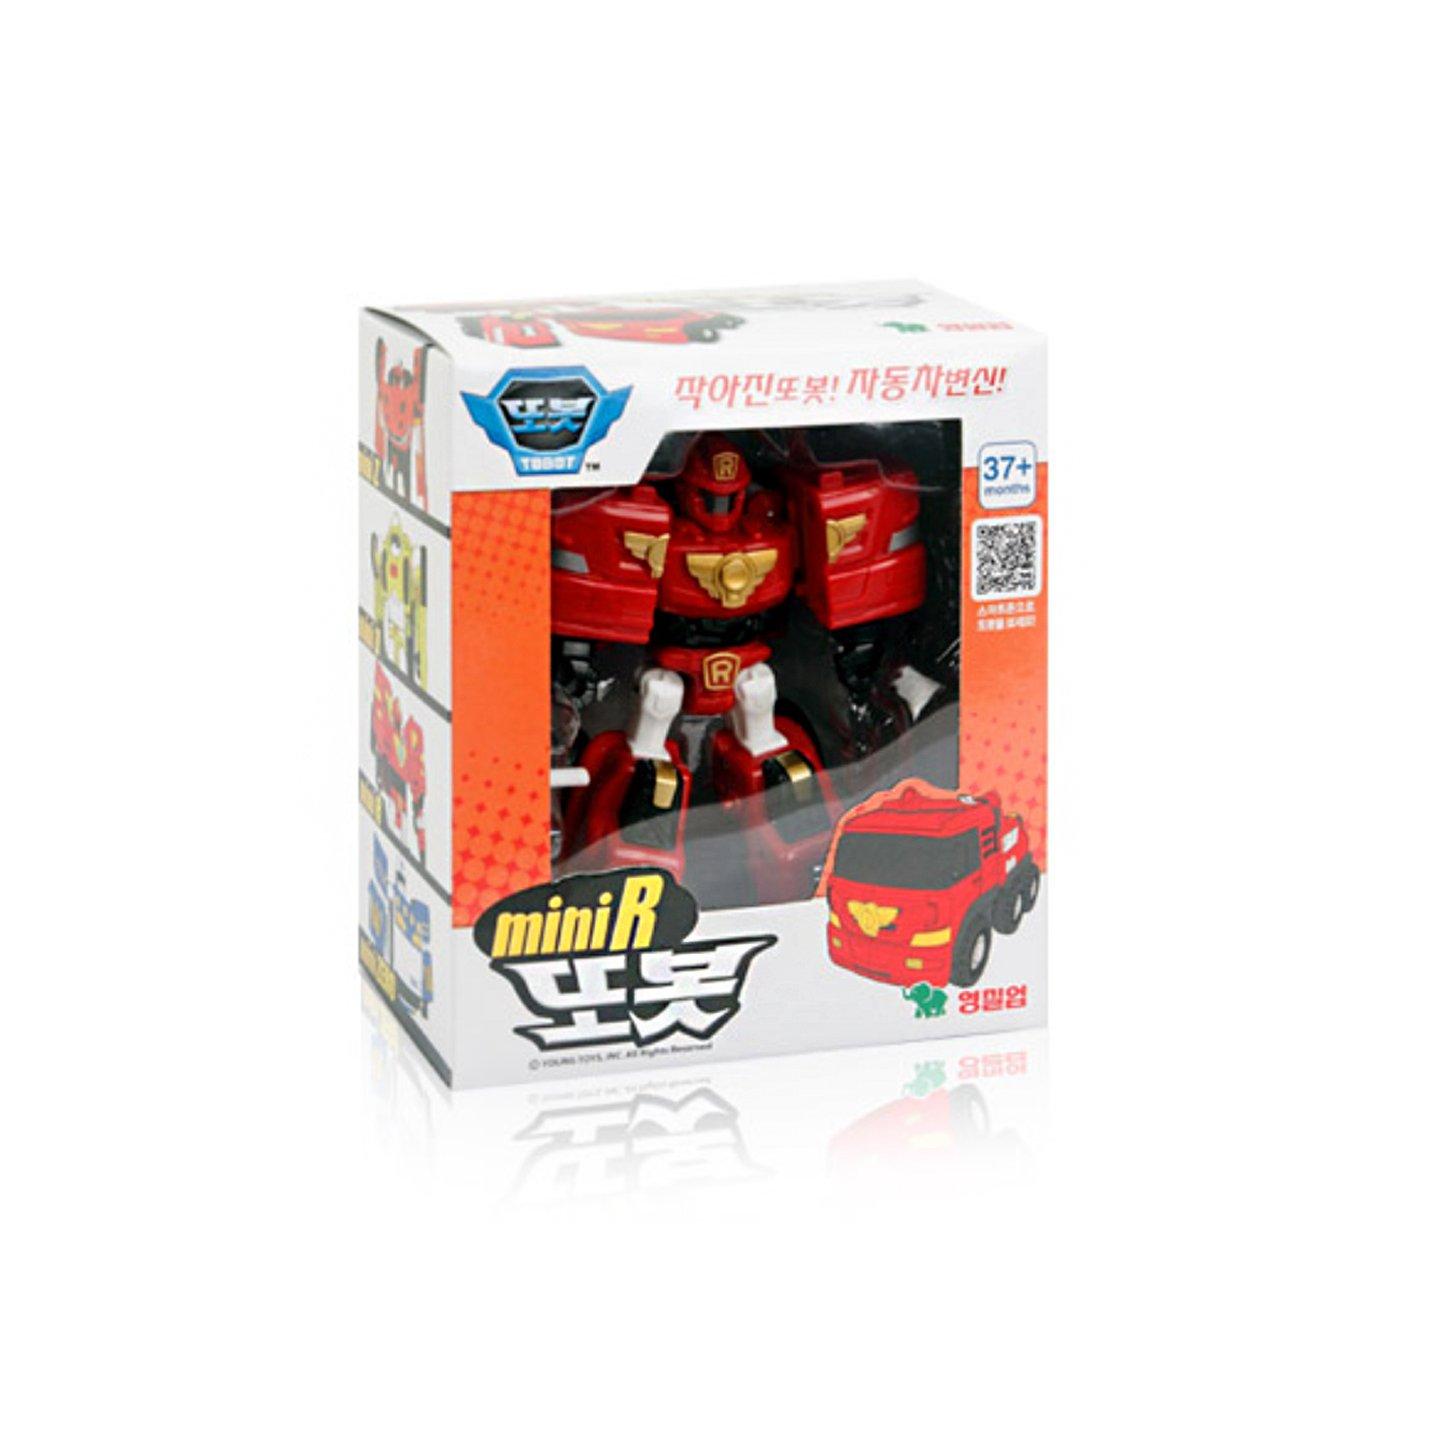 Amazon Tobot R Mini Transformer Korean Animation Robot Character Toys & Games